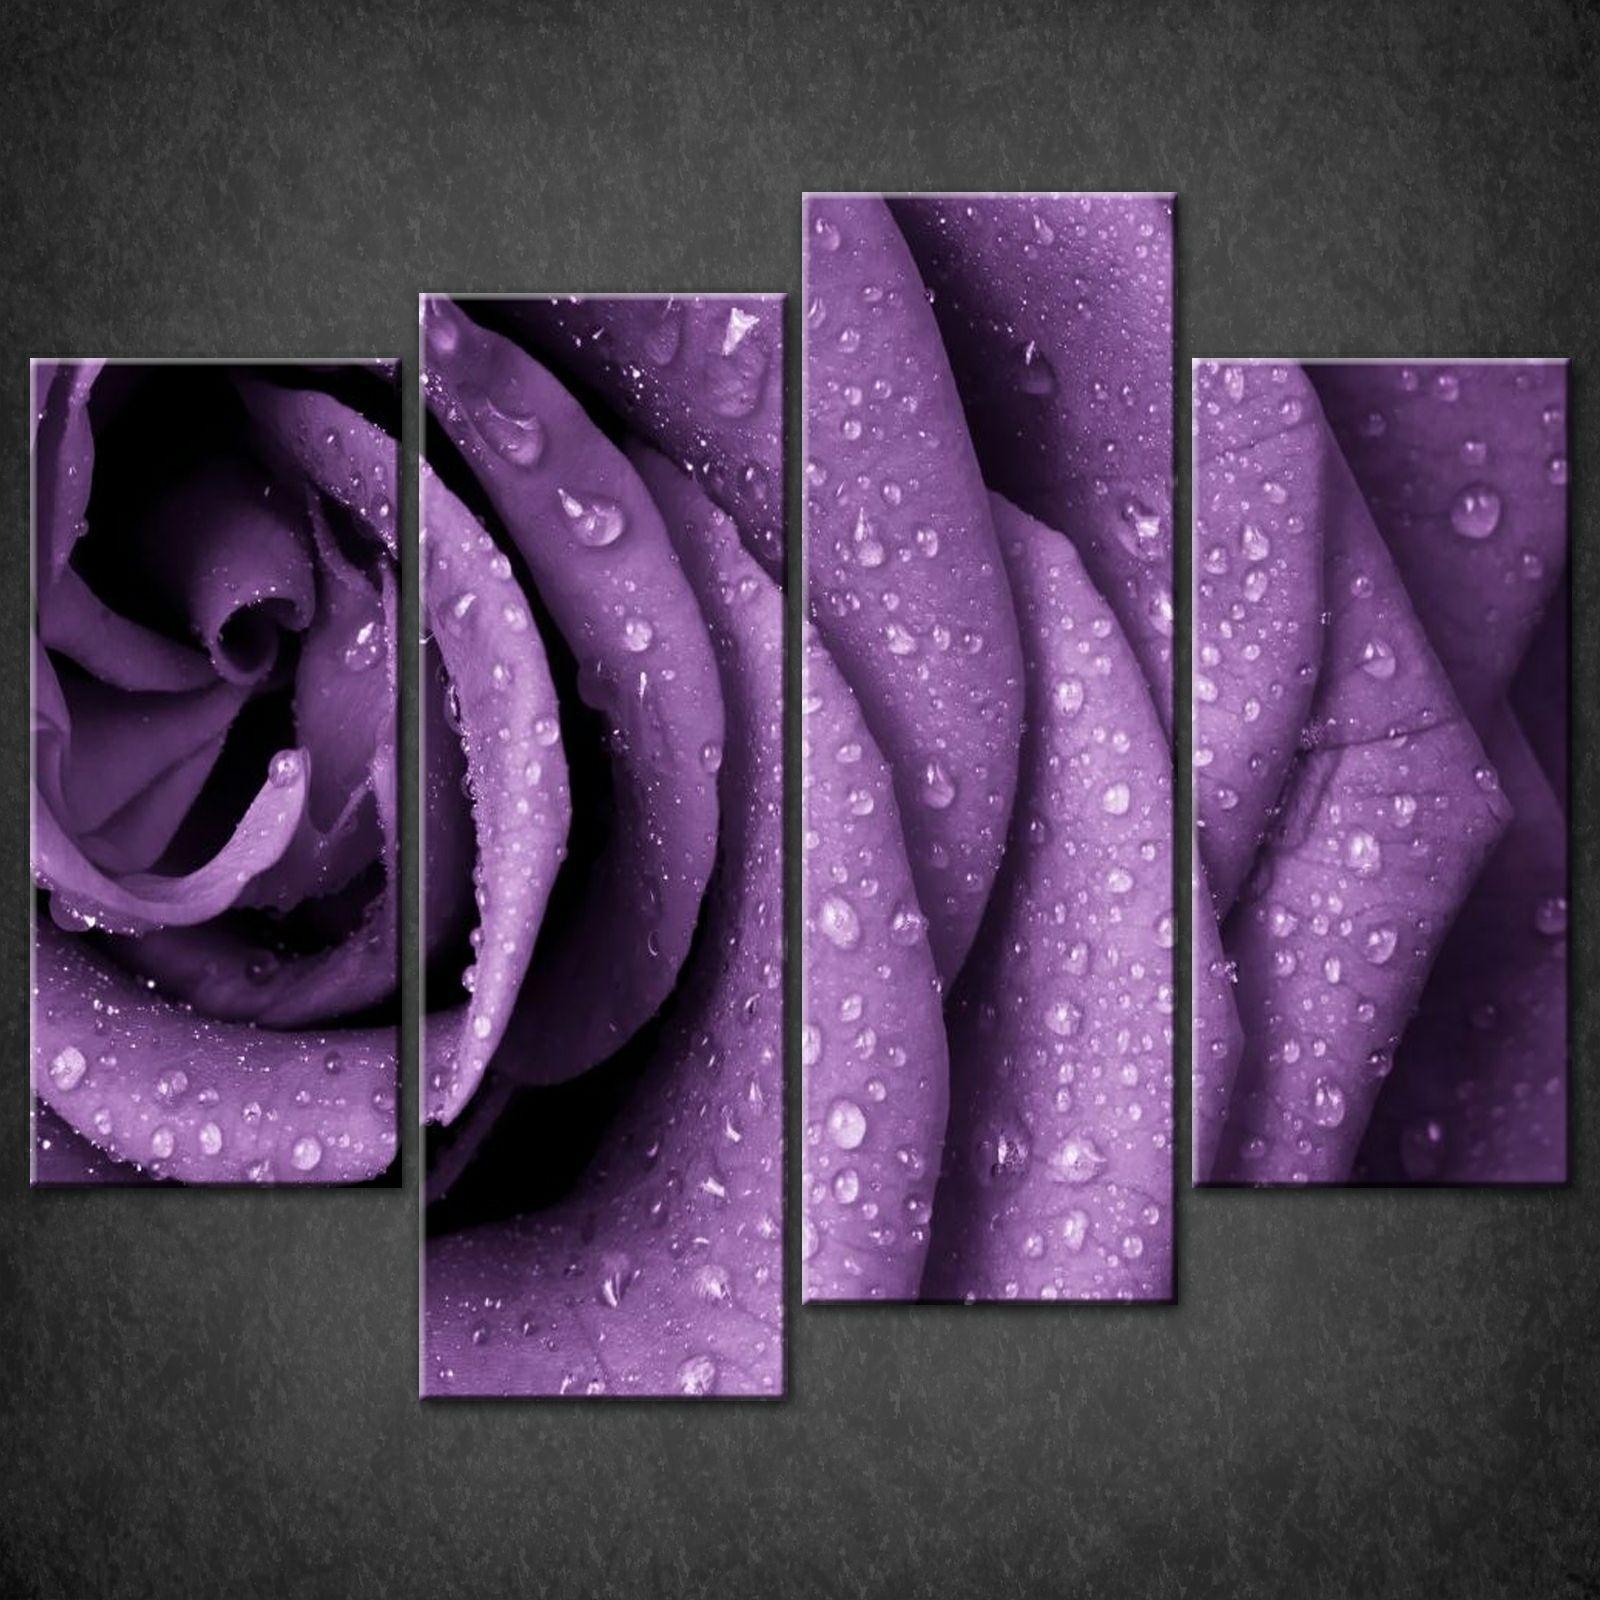 Wall Art: Beautiful Gallery Purple Wall Art Canvas Wall Art With For Current Canvas Wall Art In Purple (View 3 of 15)